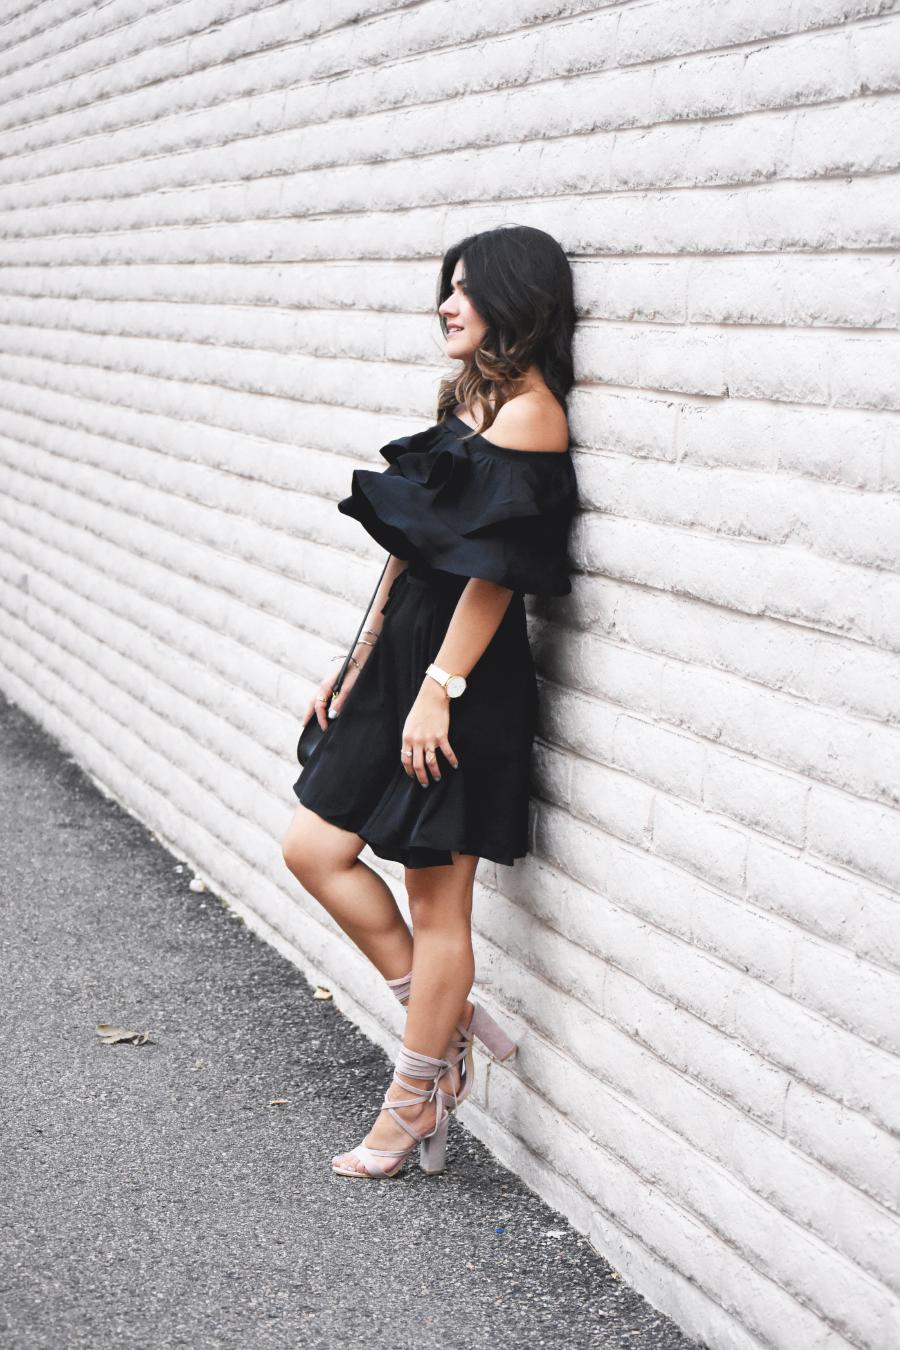 A fresh take on the little black dress